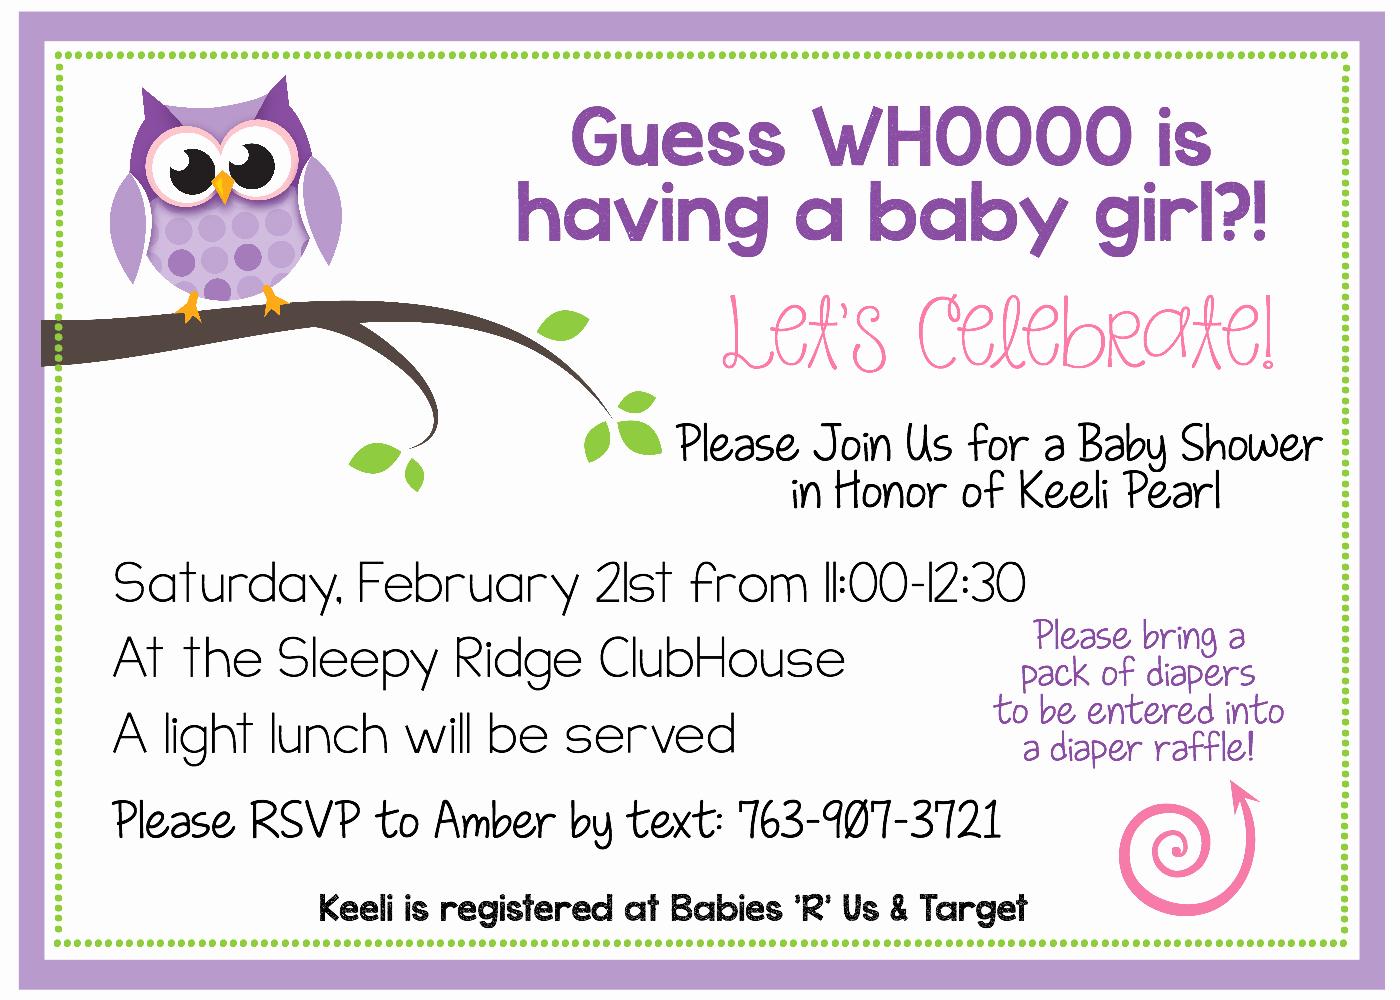 Baby Shower Invitation Printable Lovely Free Printable Owl Baby Shower Invitations & Other